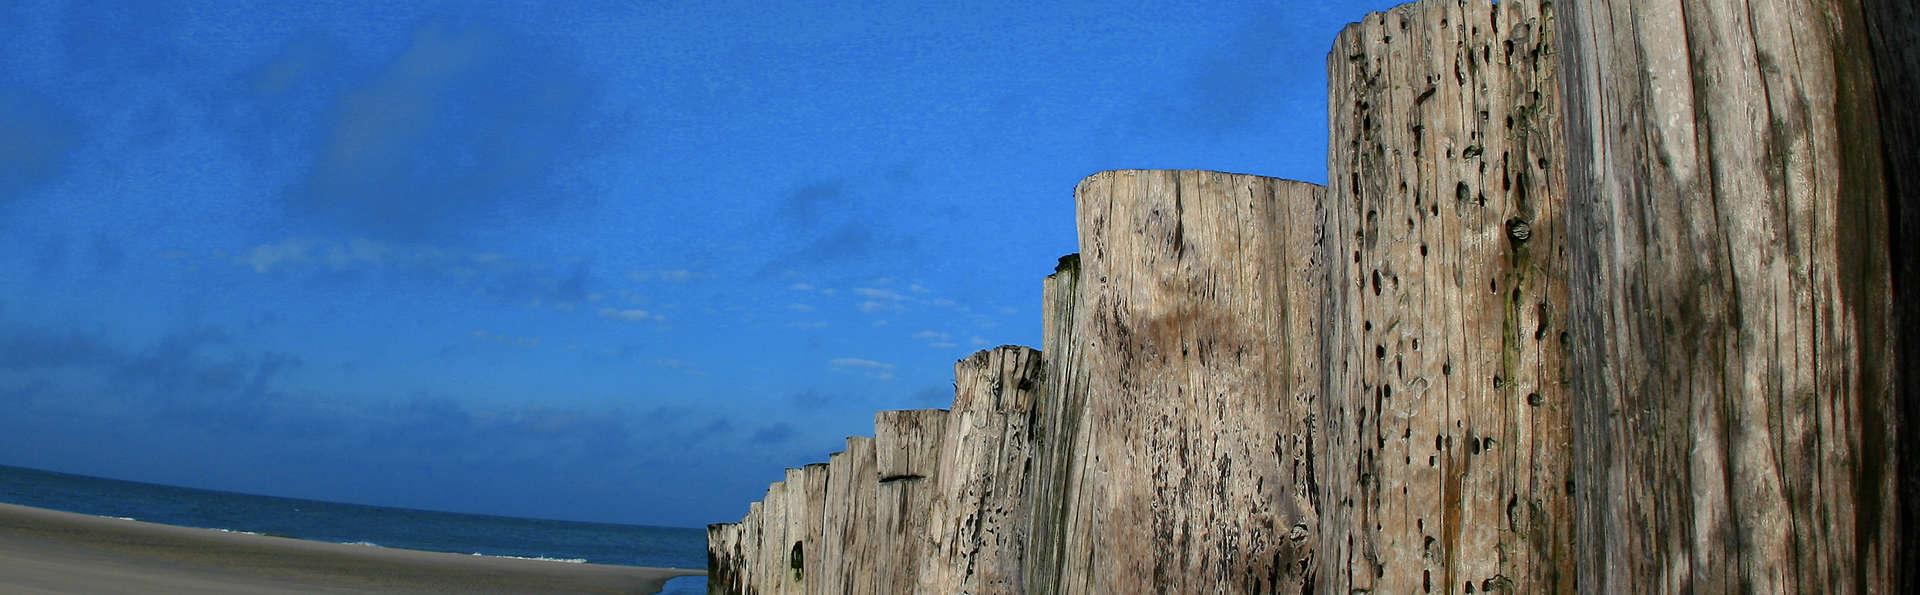 De Zeeuwse Stromen - Edit_destination2.jpg